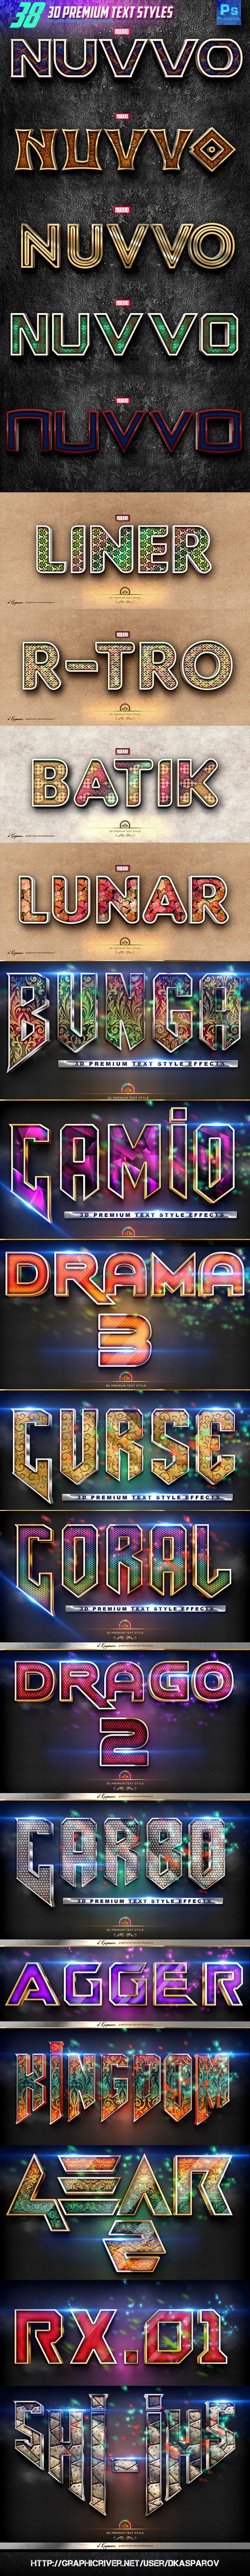 38 3D Premium Text Style Bundle - Text Effects Styles